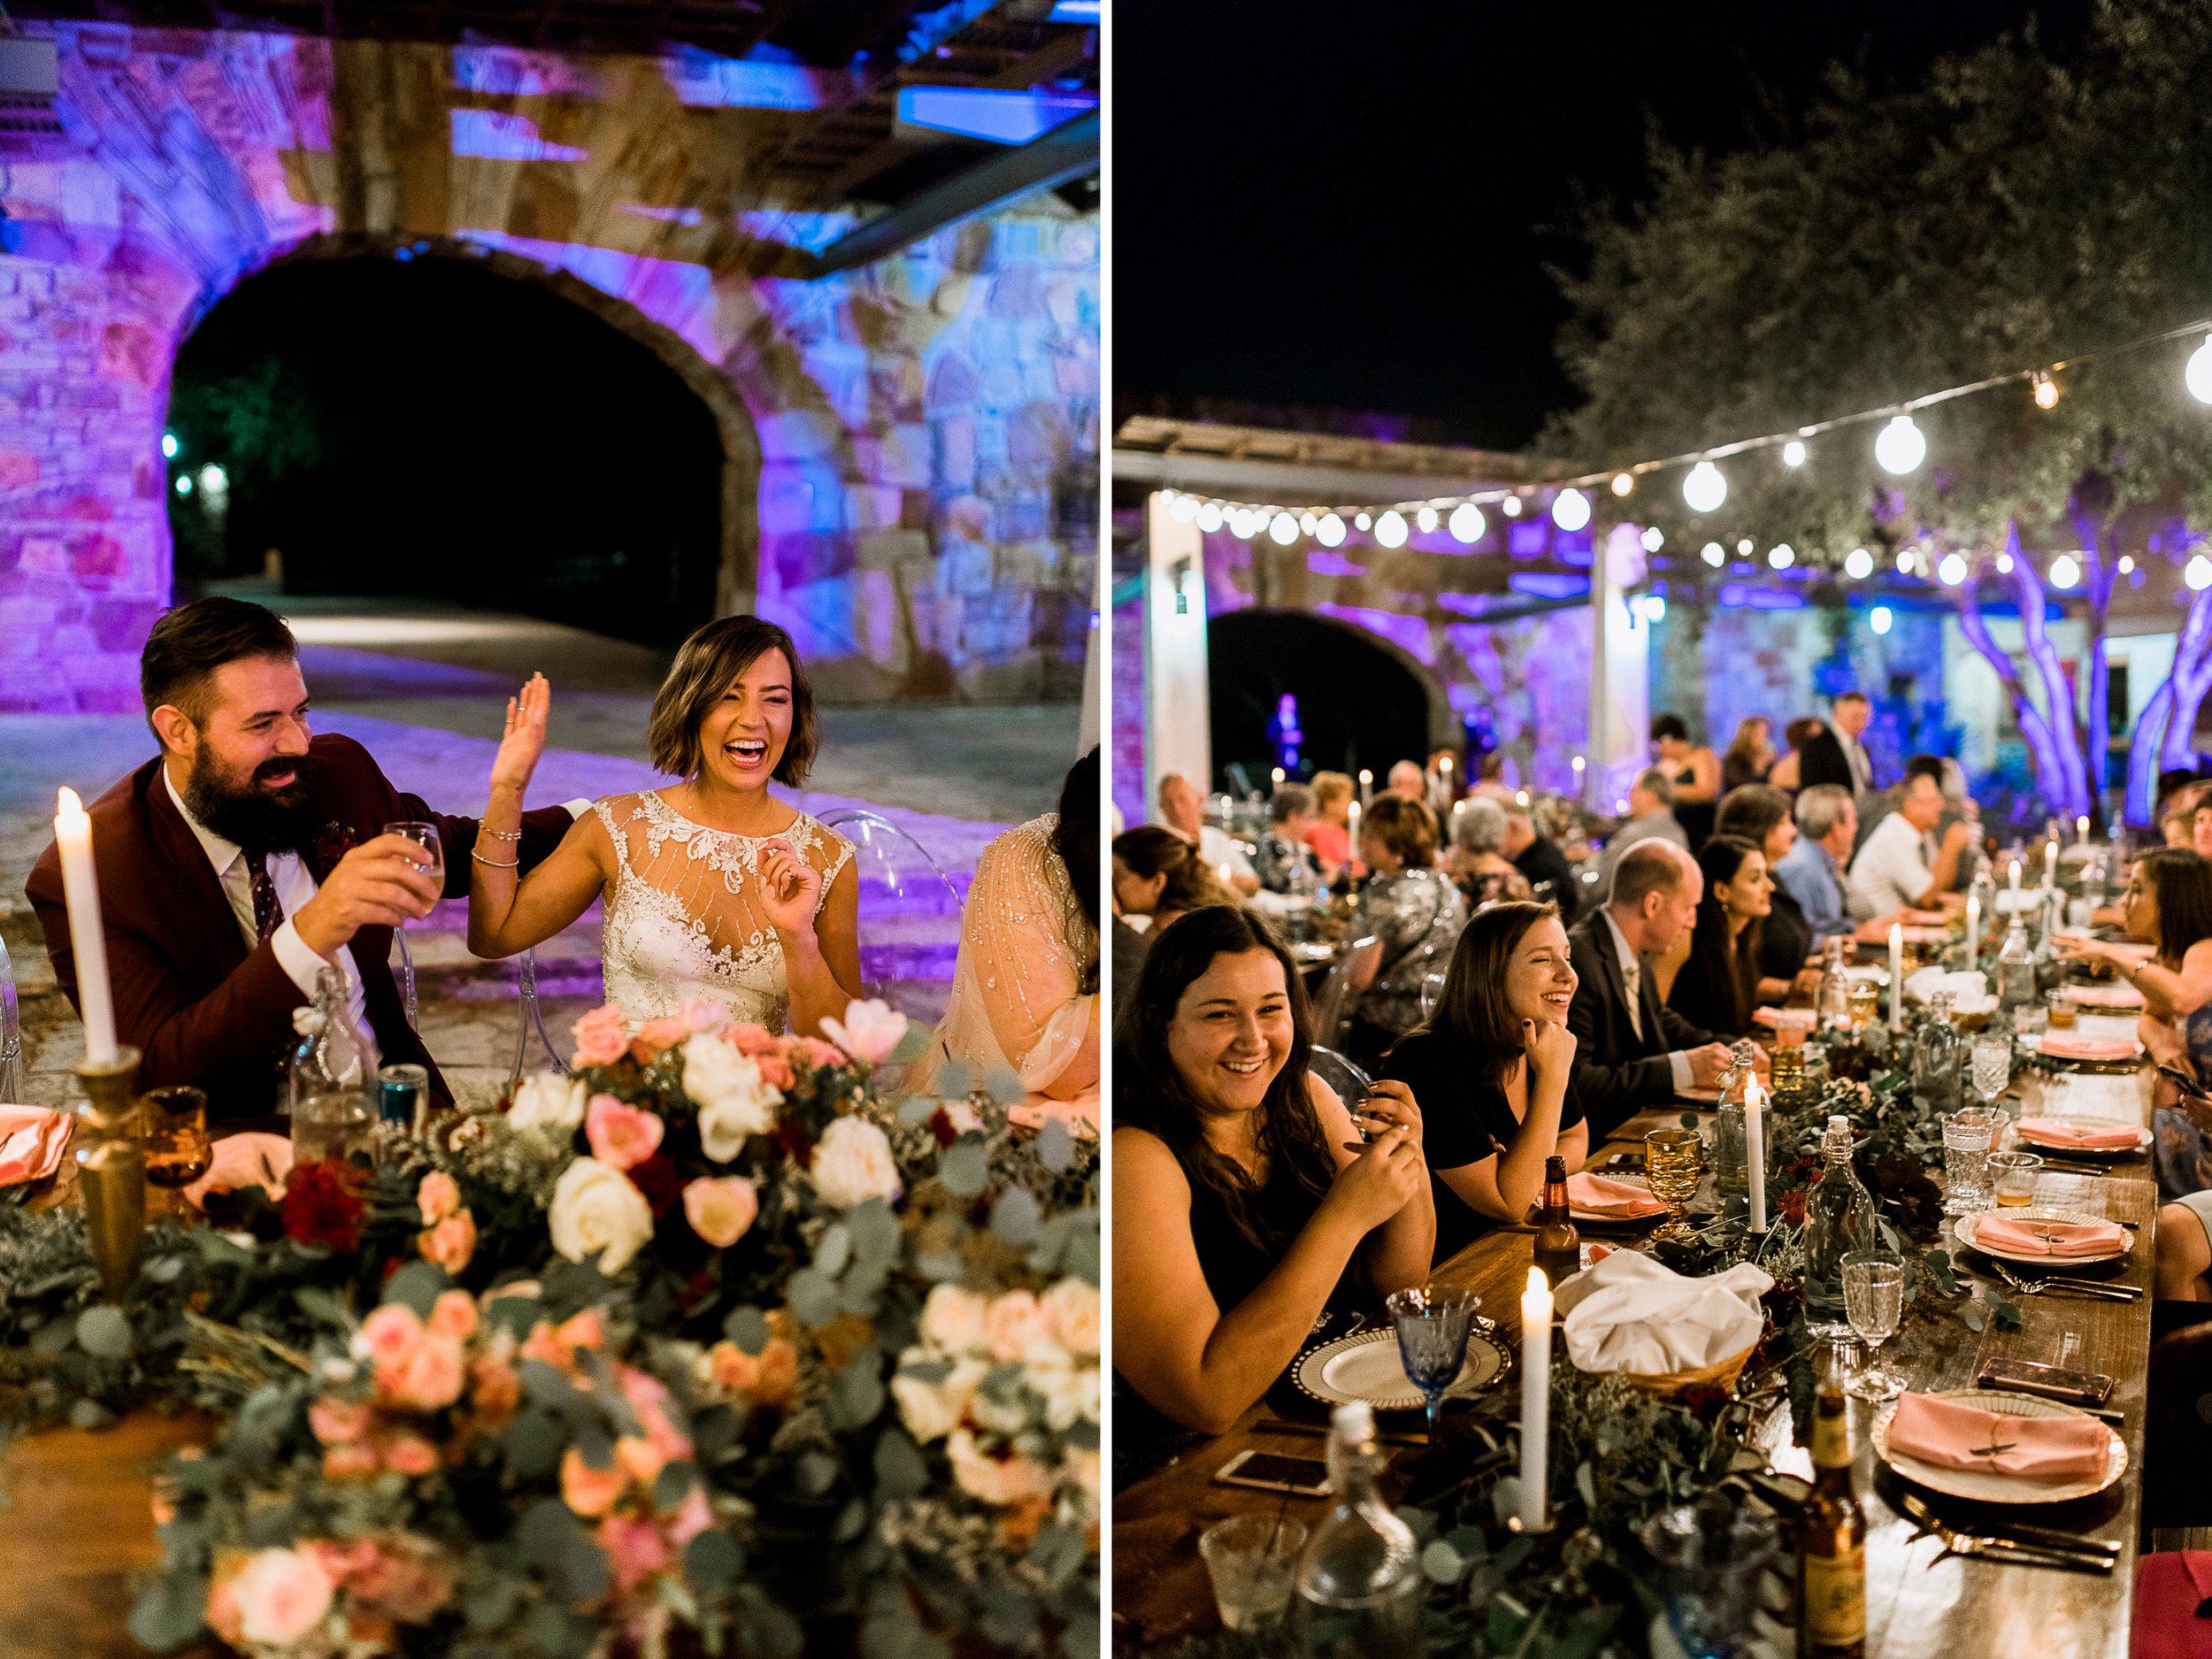 Fall Garden party wedding at Lady Bird Johnson Wildflower Center // austin, texas wedding photographer // www.abbihearne.com